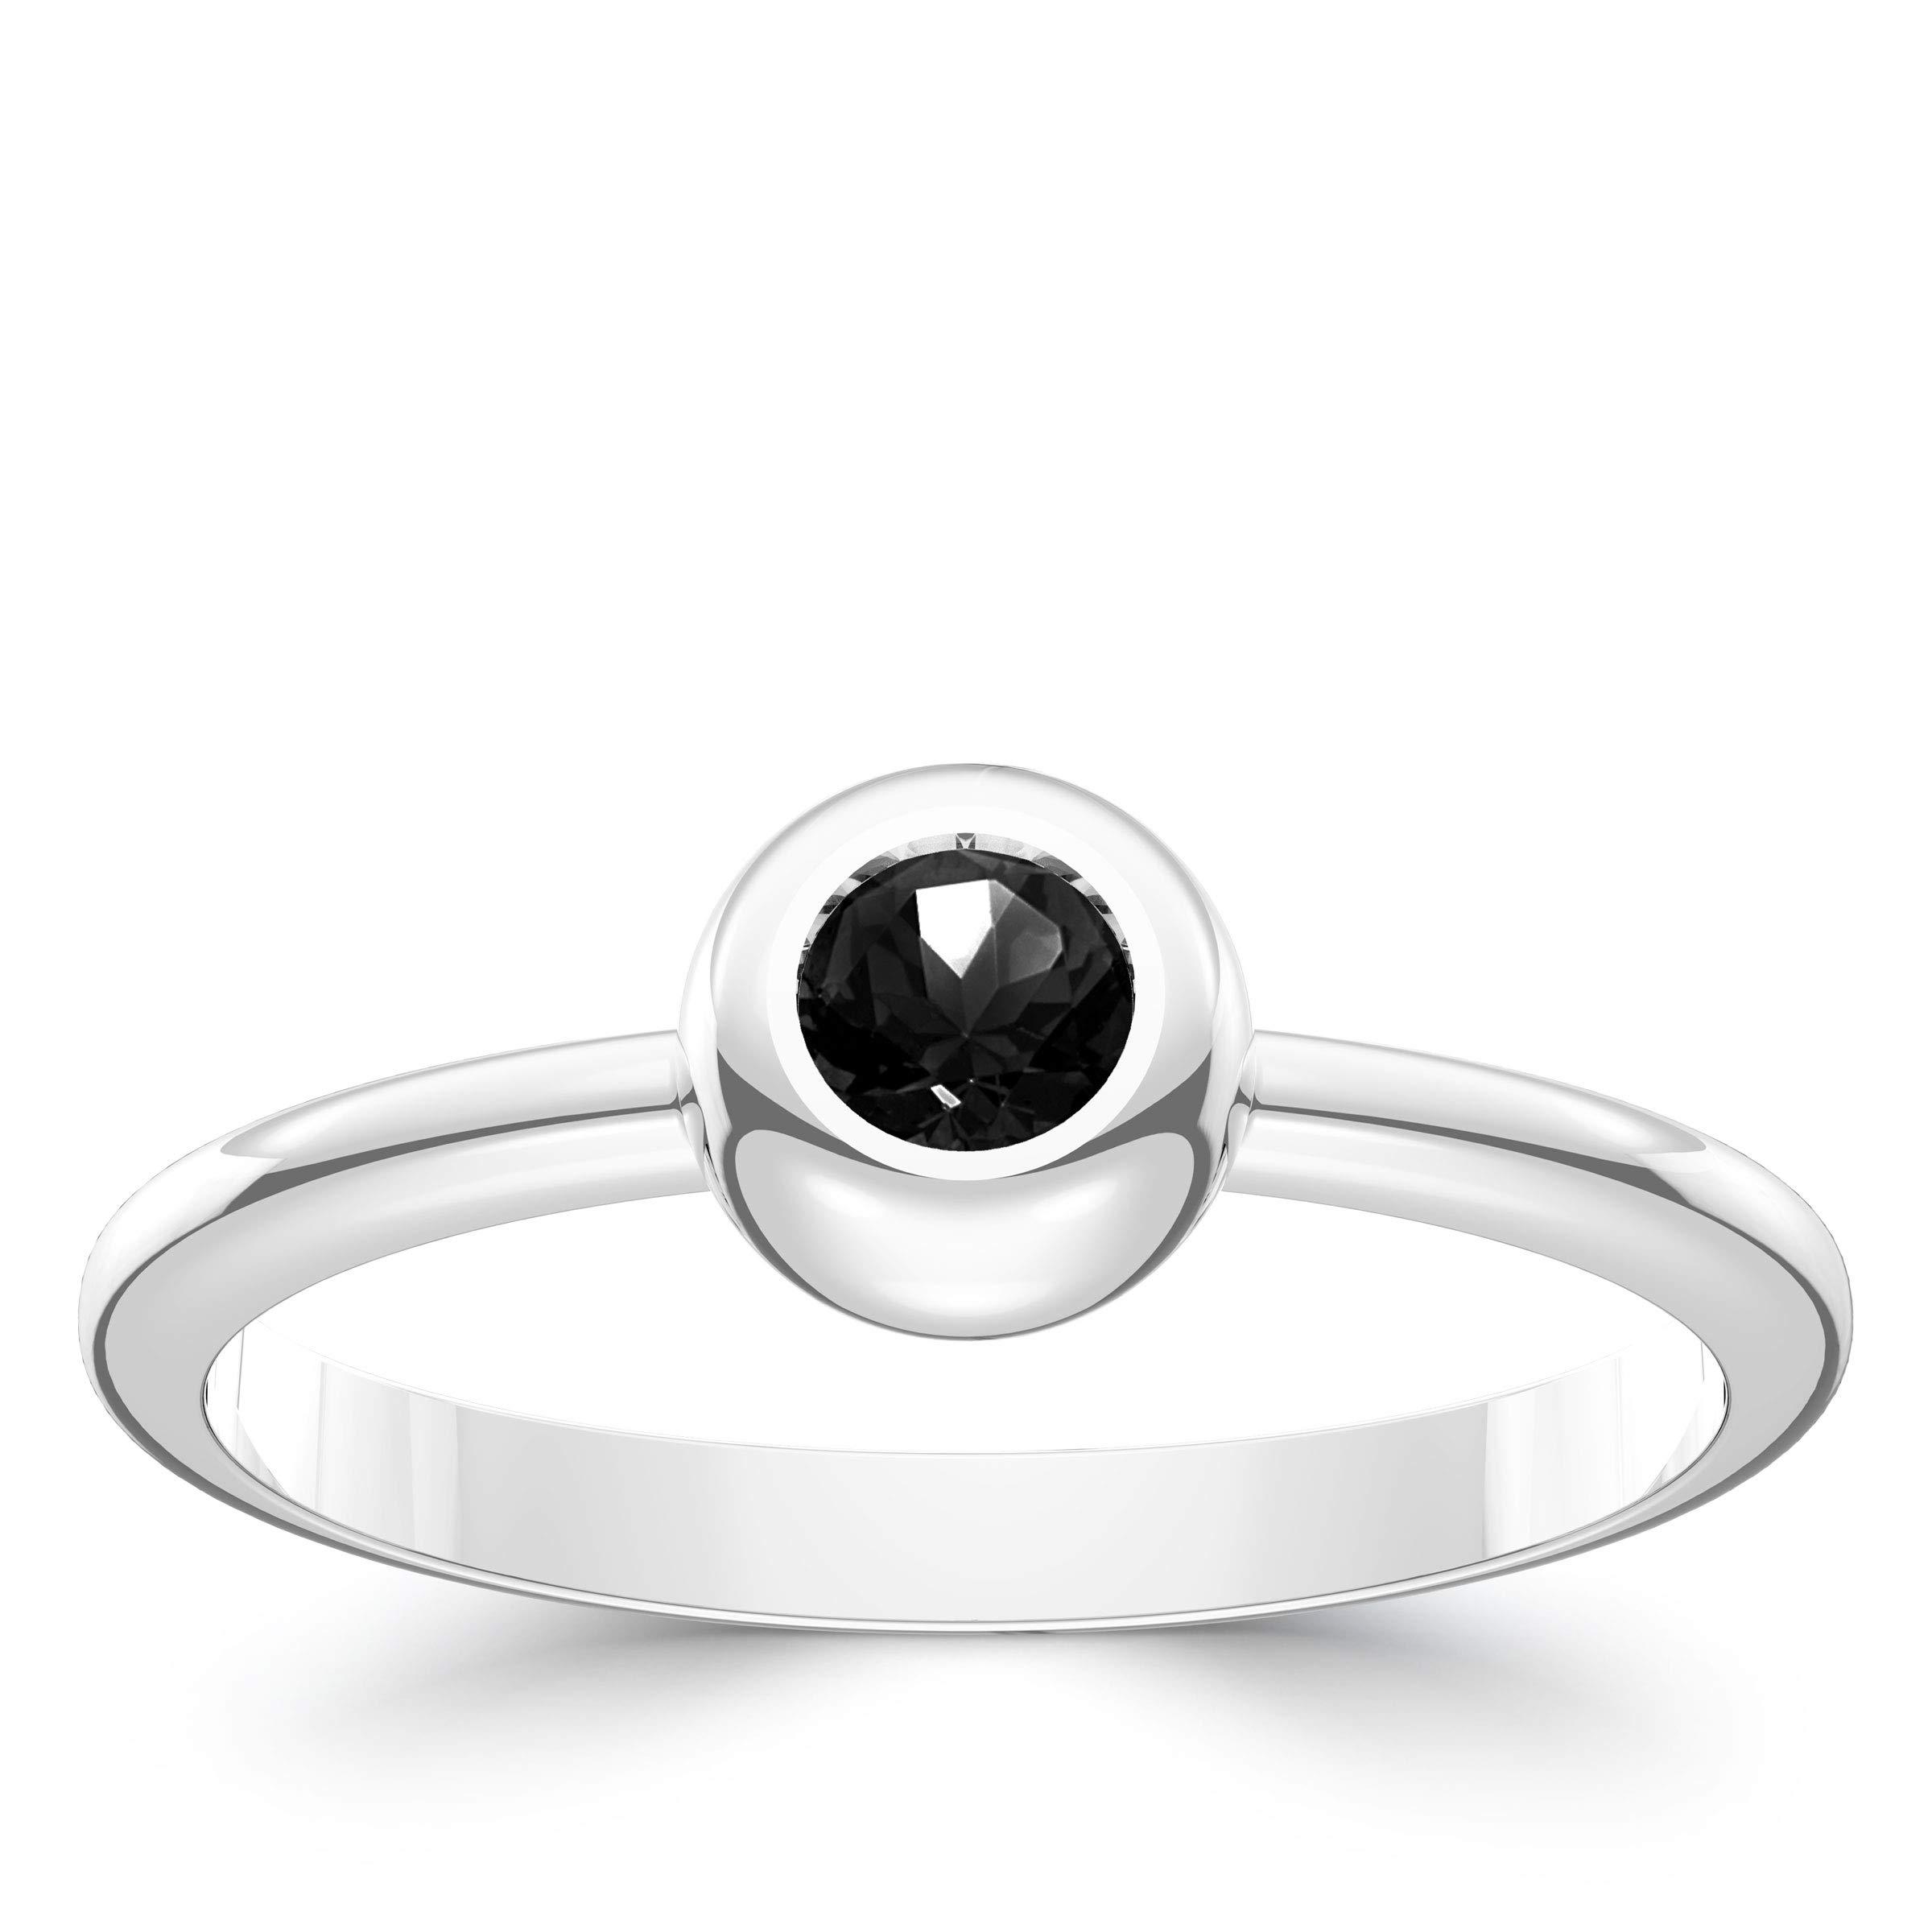 Gumdrop Black Diamond Ring in Sterling Silver by Bixler